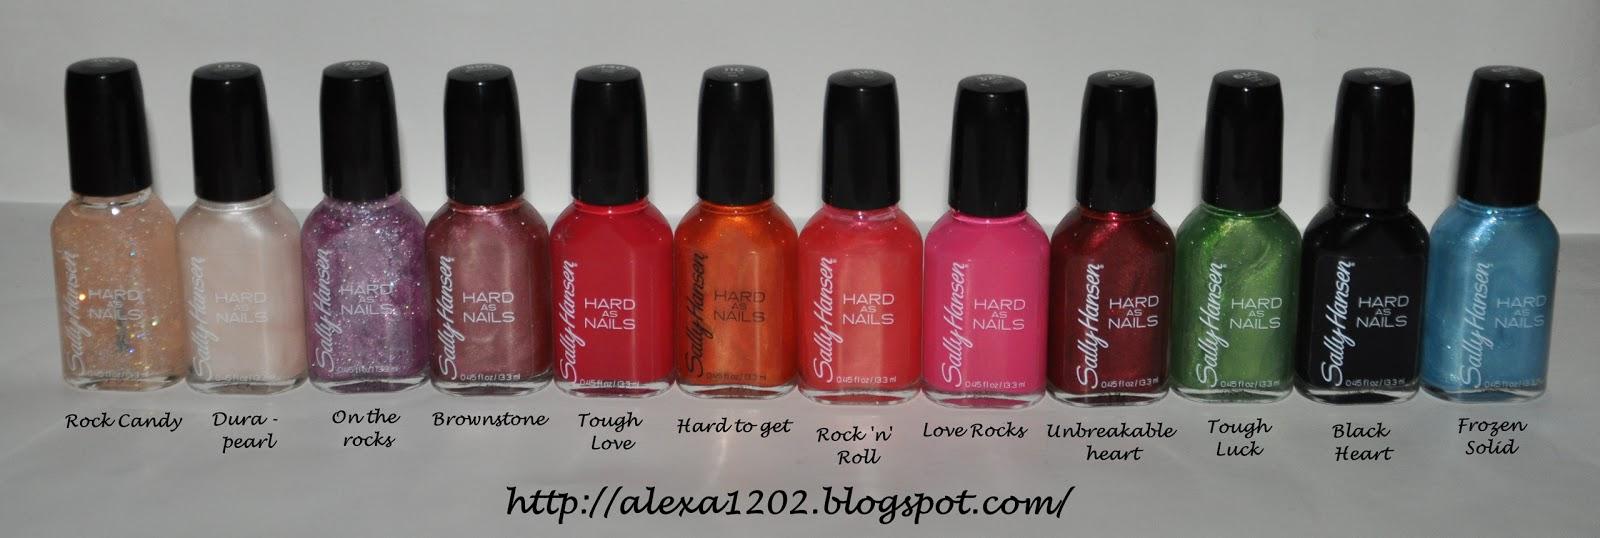 Sally Hansen Nail Polish Colors Chart Hession Hairdressing